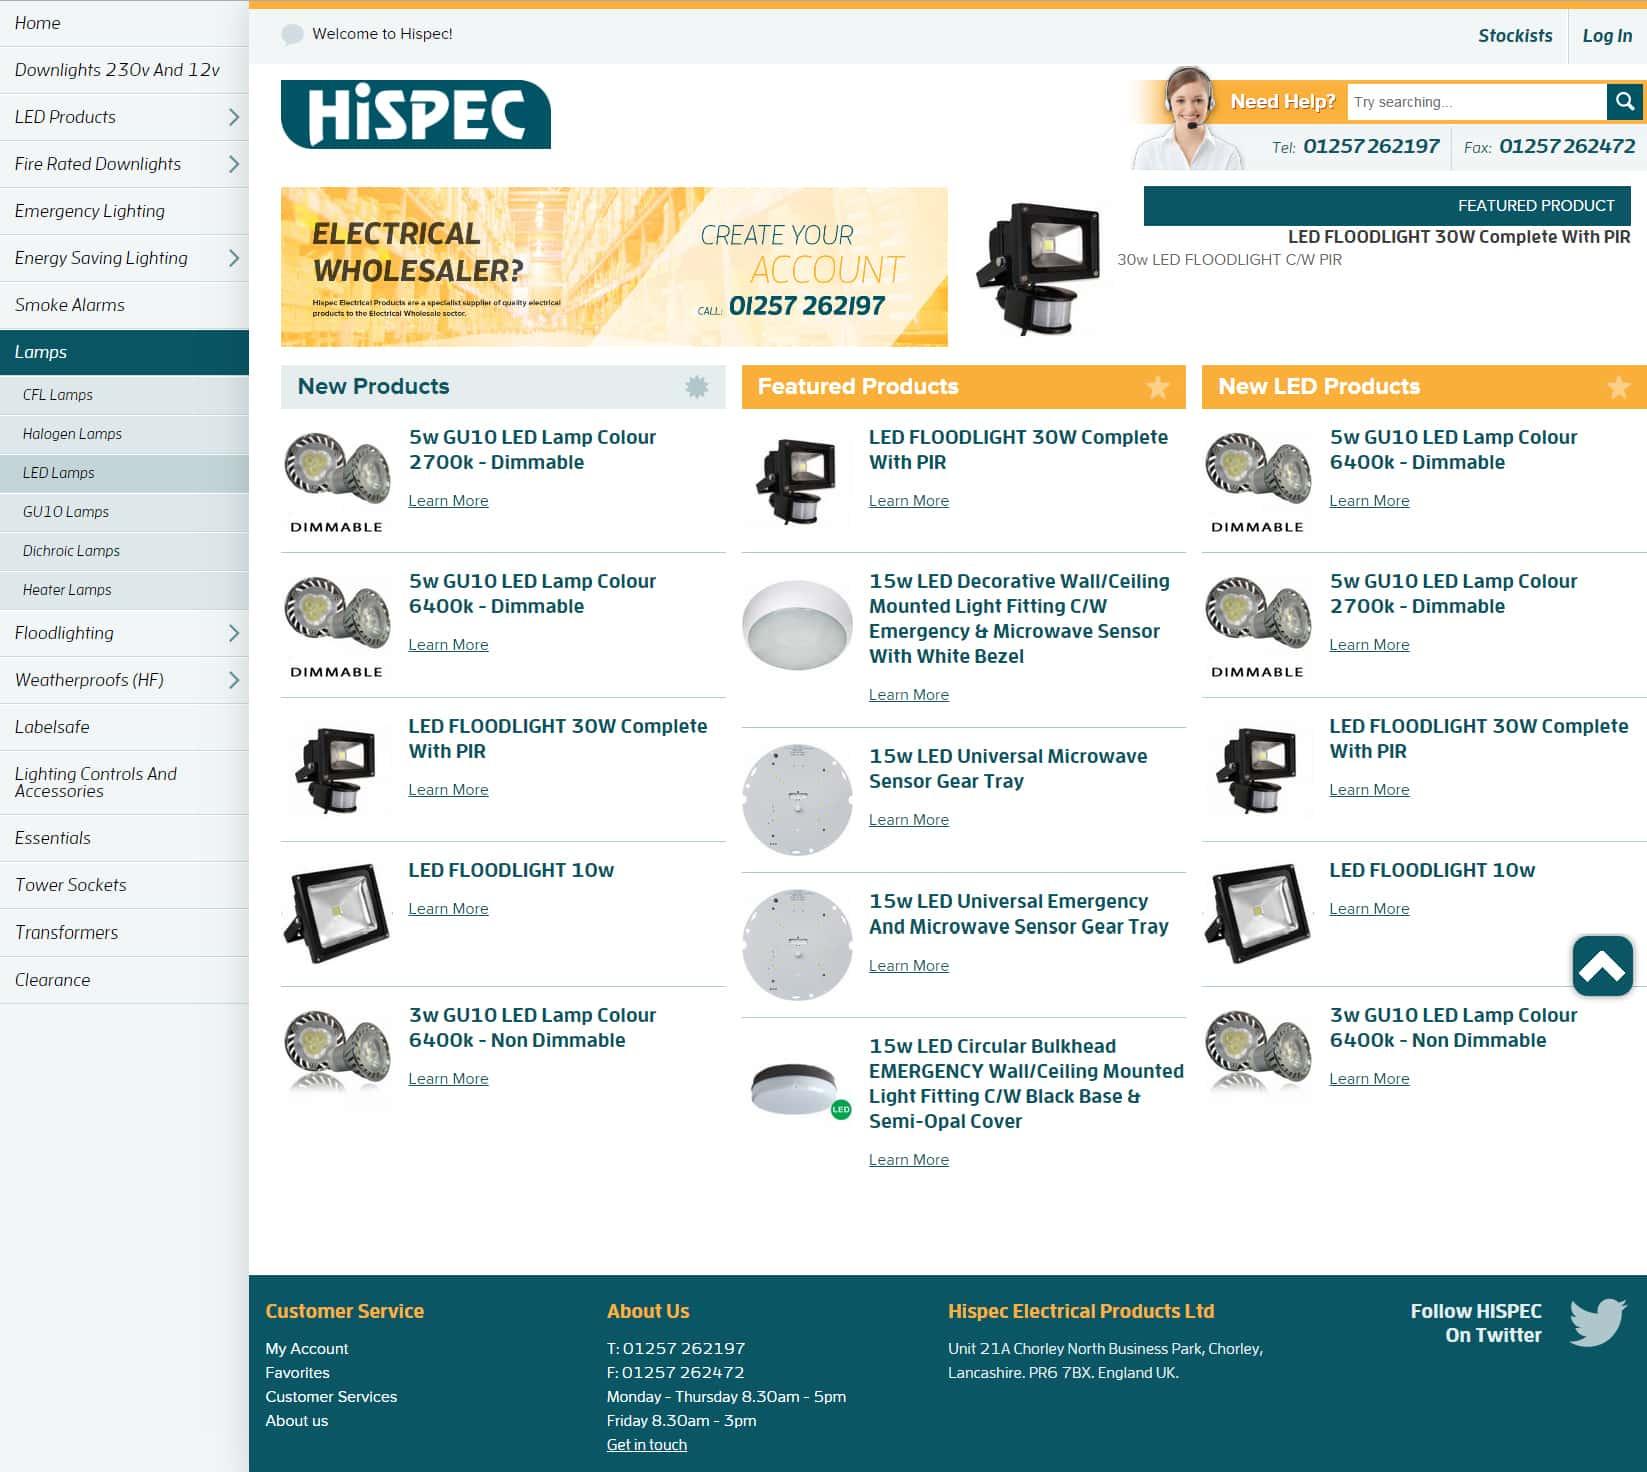 Hispec Magento ecommerce website